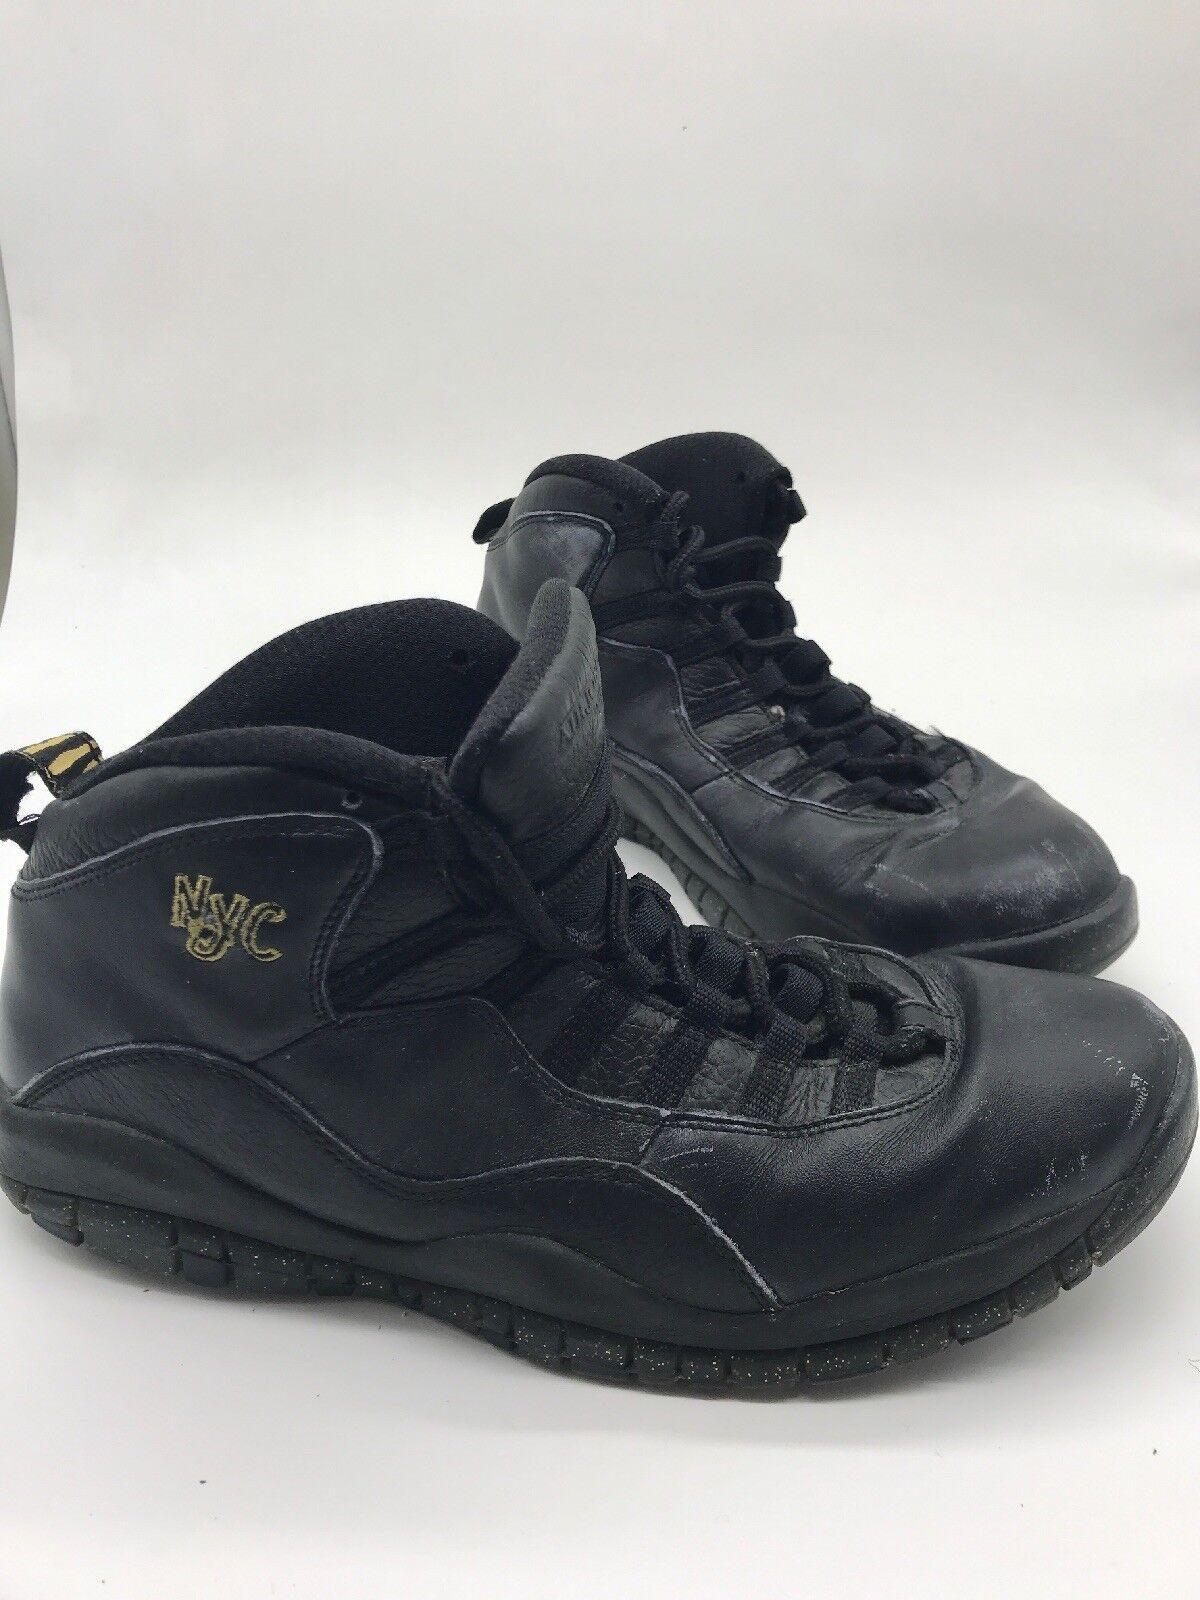 Nike Air Jordan Retro 10 NYC 310805-012 Black Size 10 City Pack DB Steel NYC